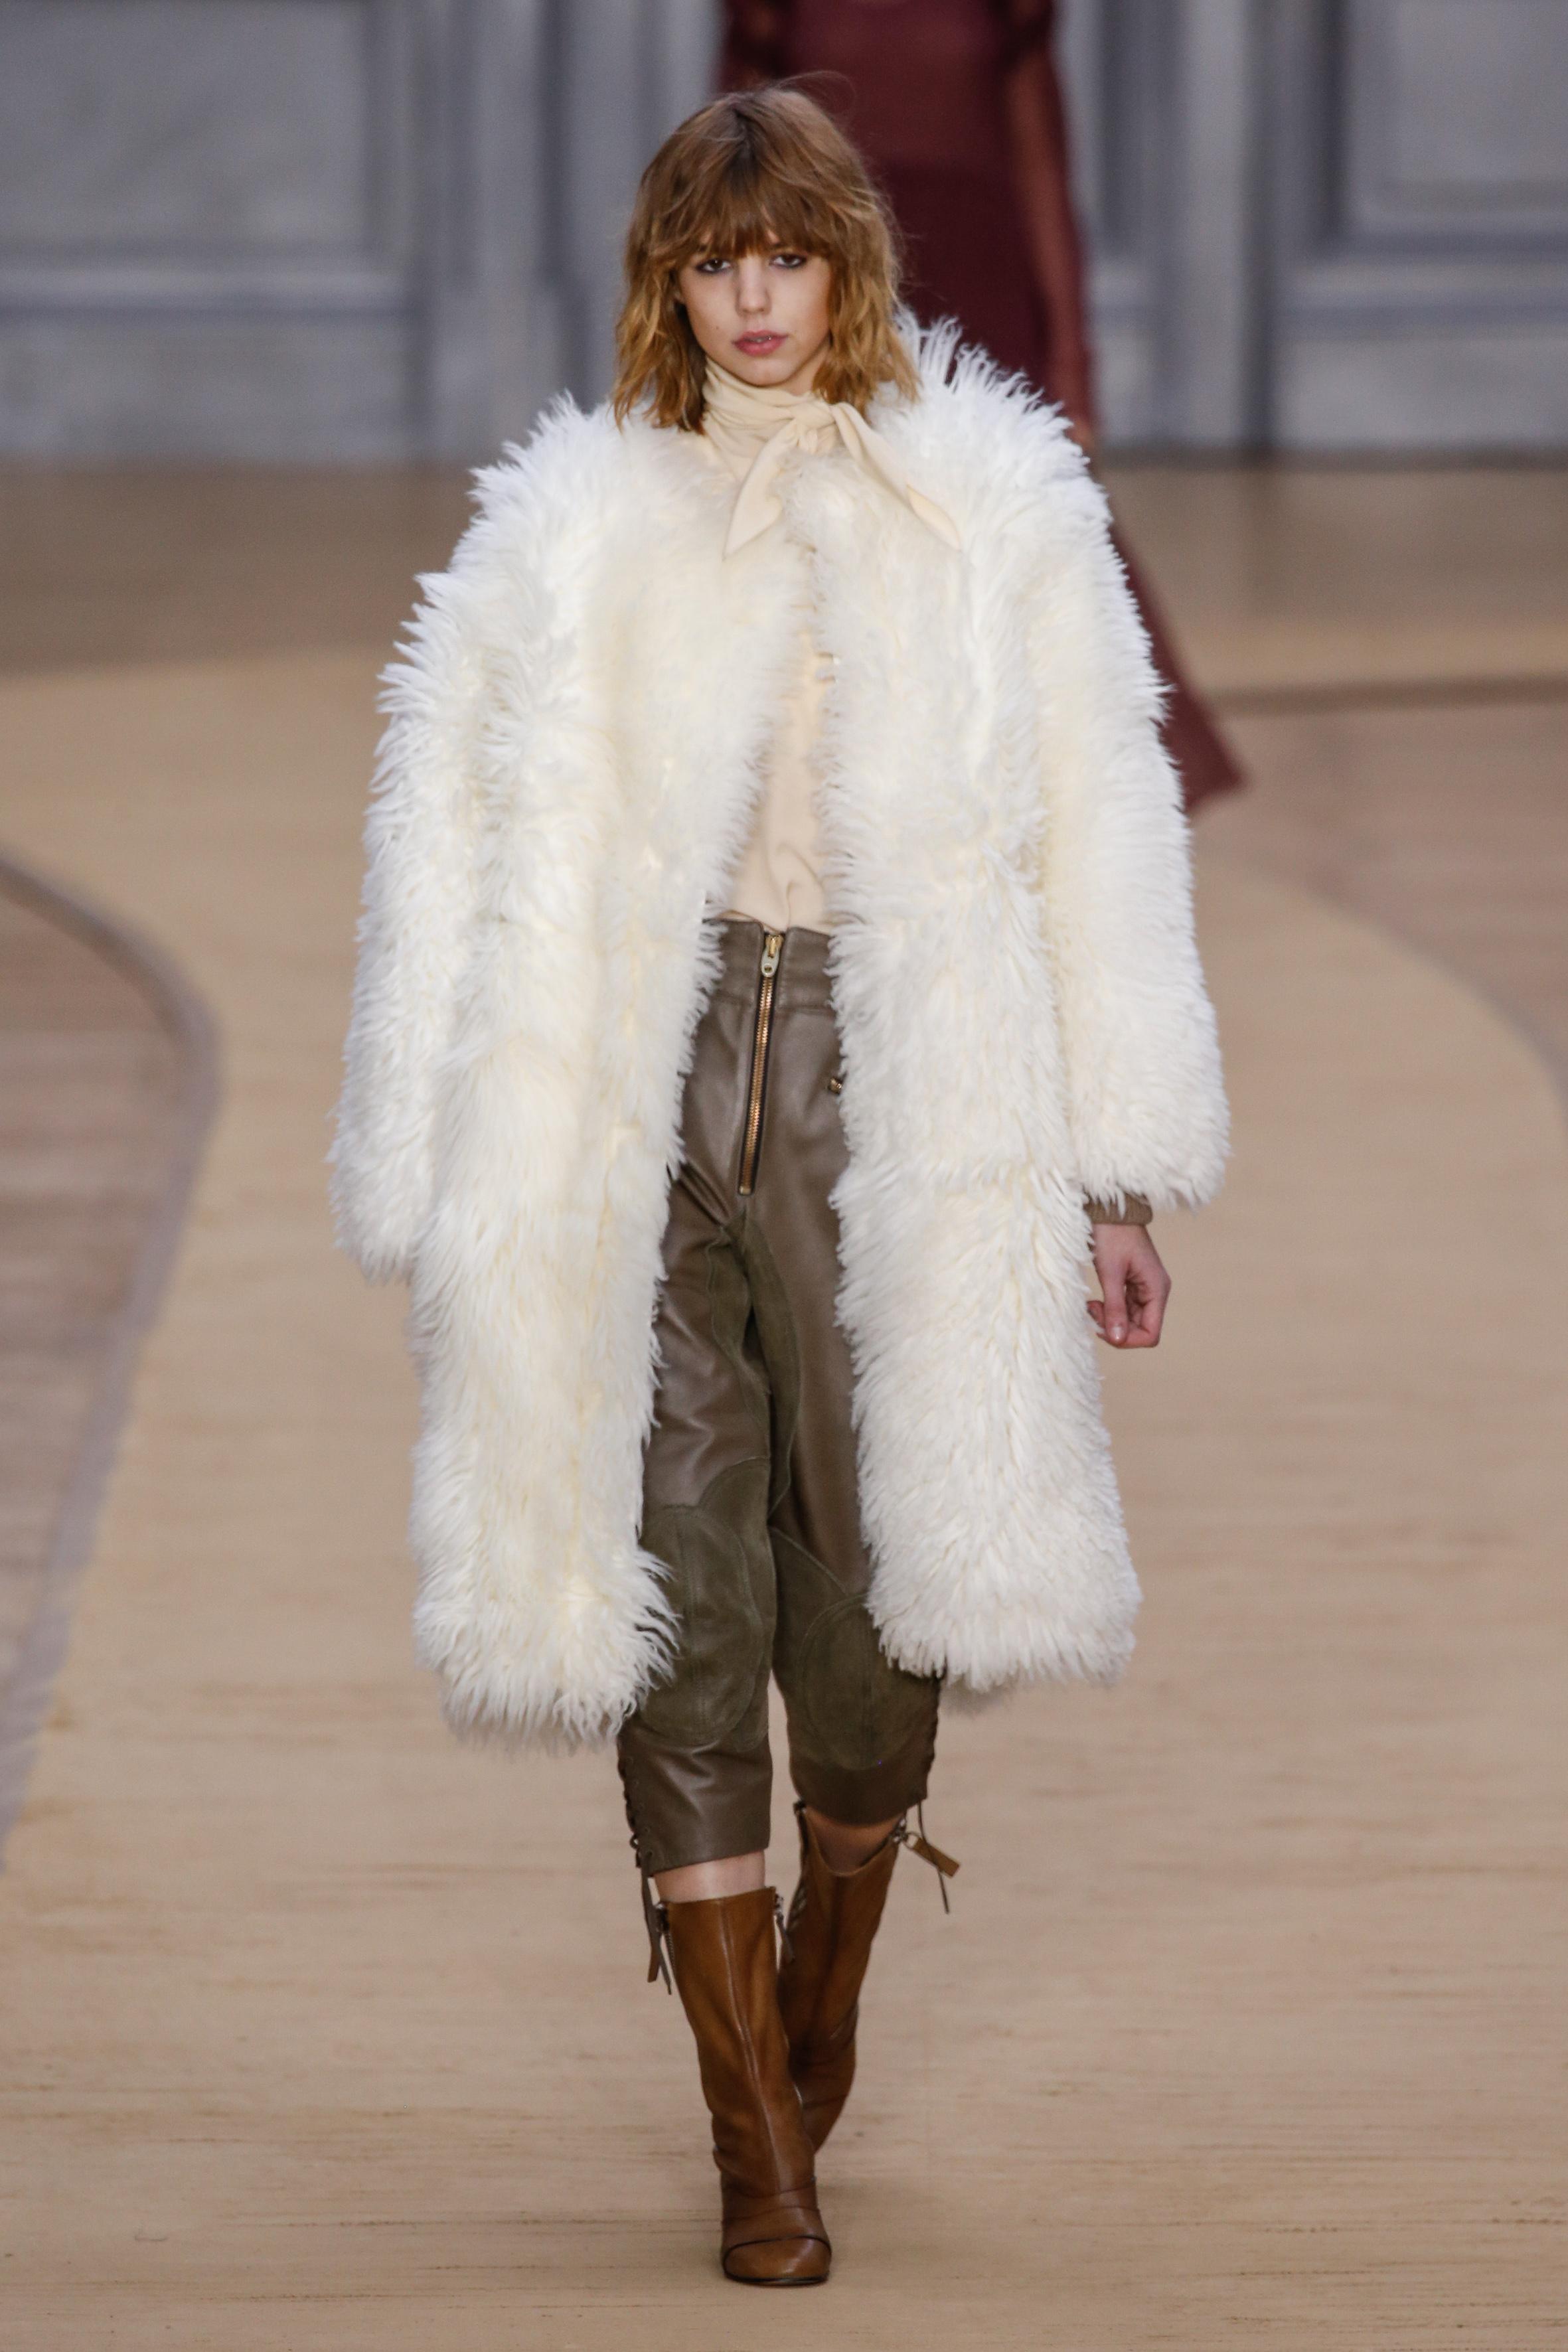 CHLOE 화이트 퍼 코트야 말로 화이트 드레스 코드에 가장 잘 어울리는 아이템일 것이다.